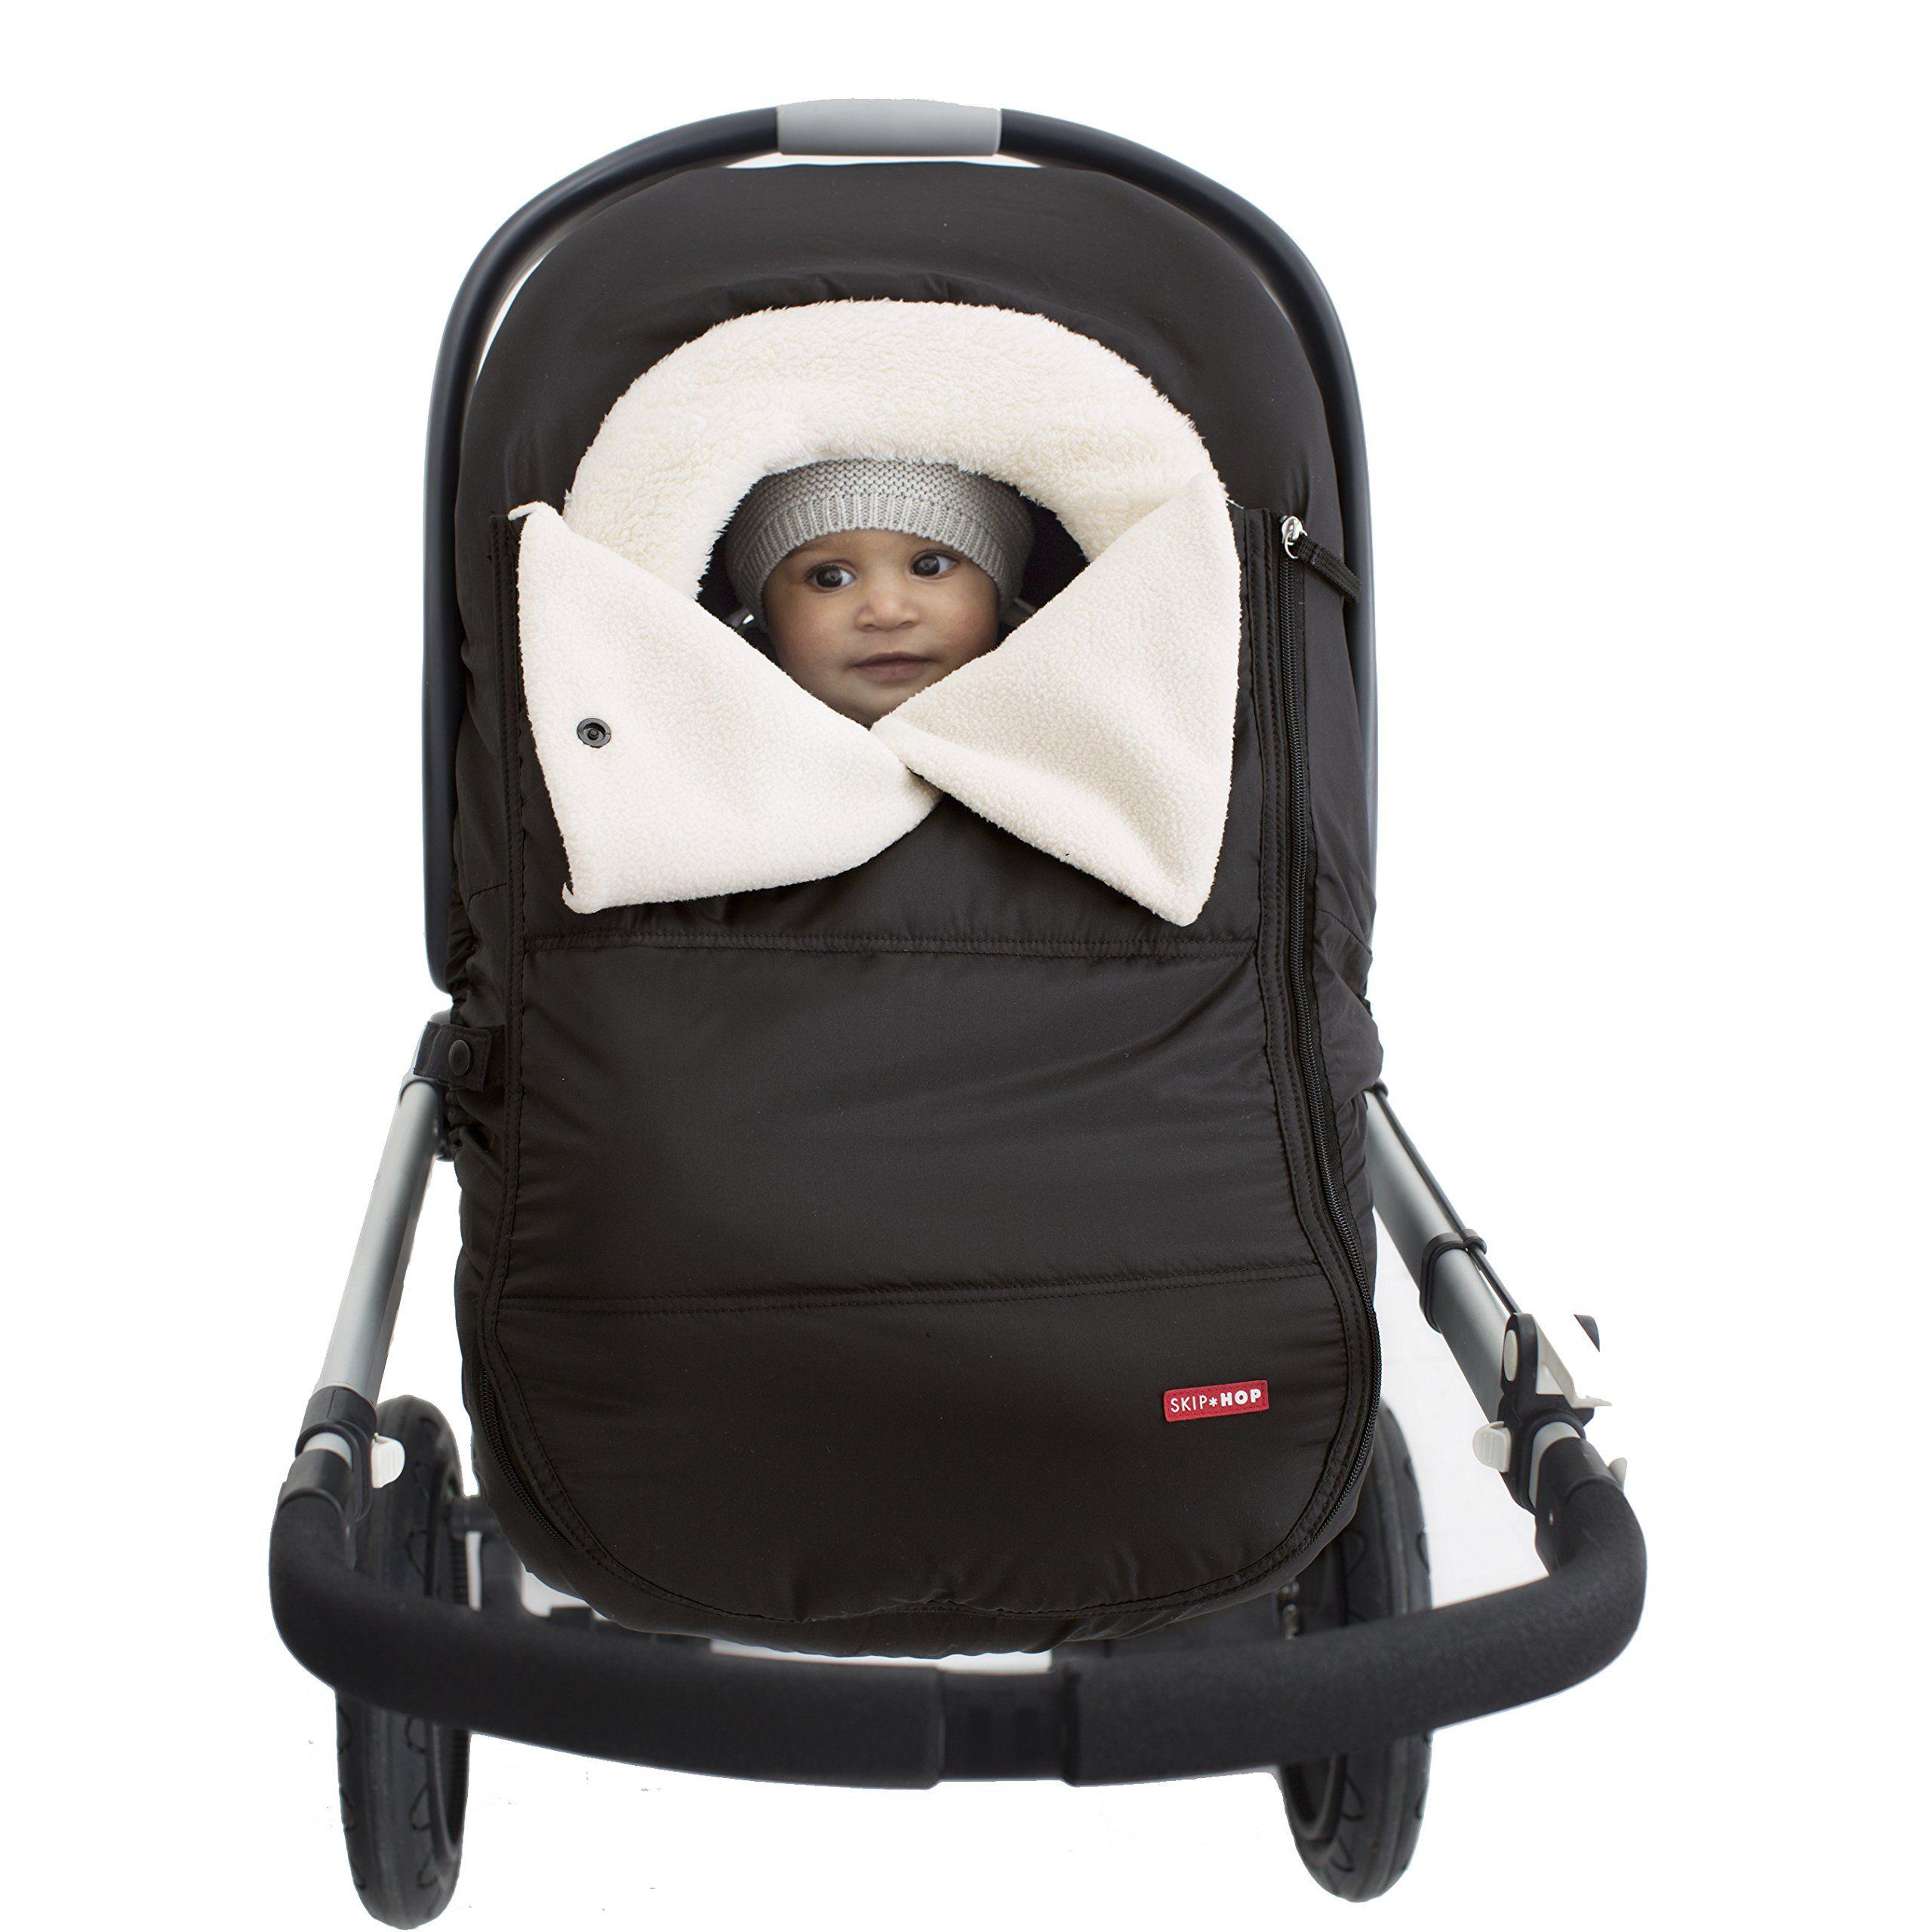 Skip Hop Stroll BabyCarSeat Car seats Baby car seats